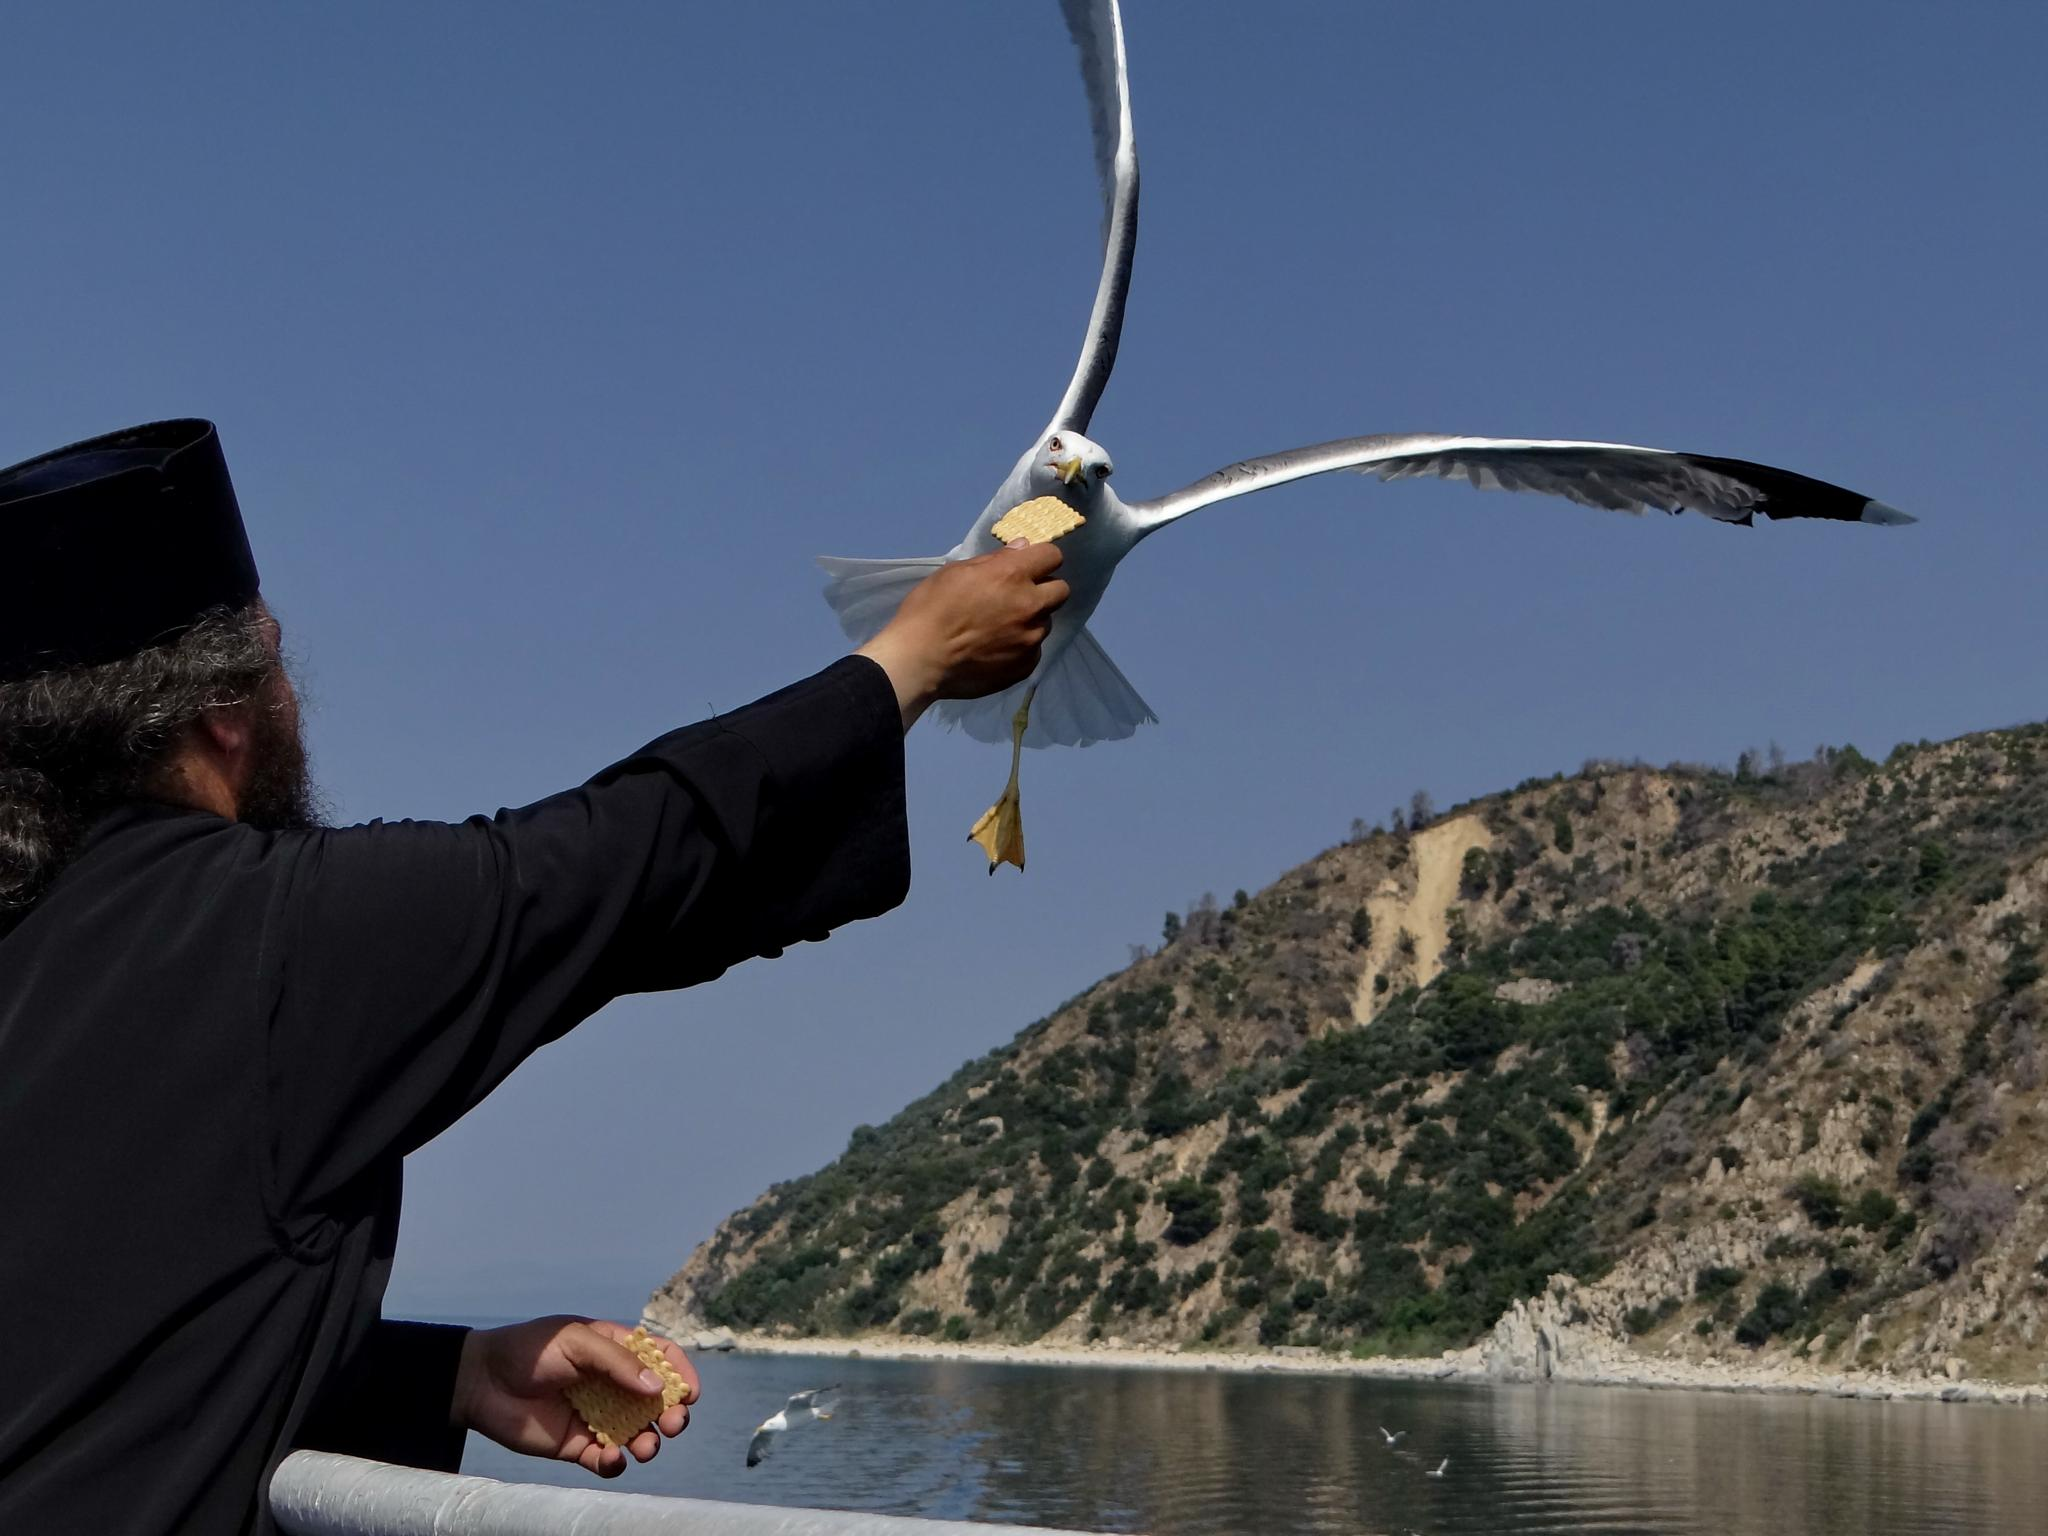 Monk and a seagull by Alekdandar Dekanski